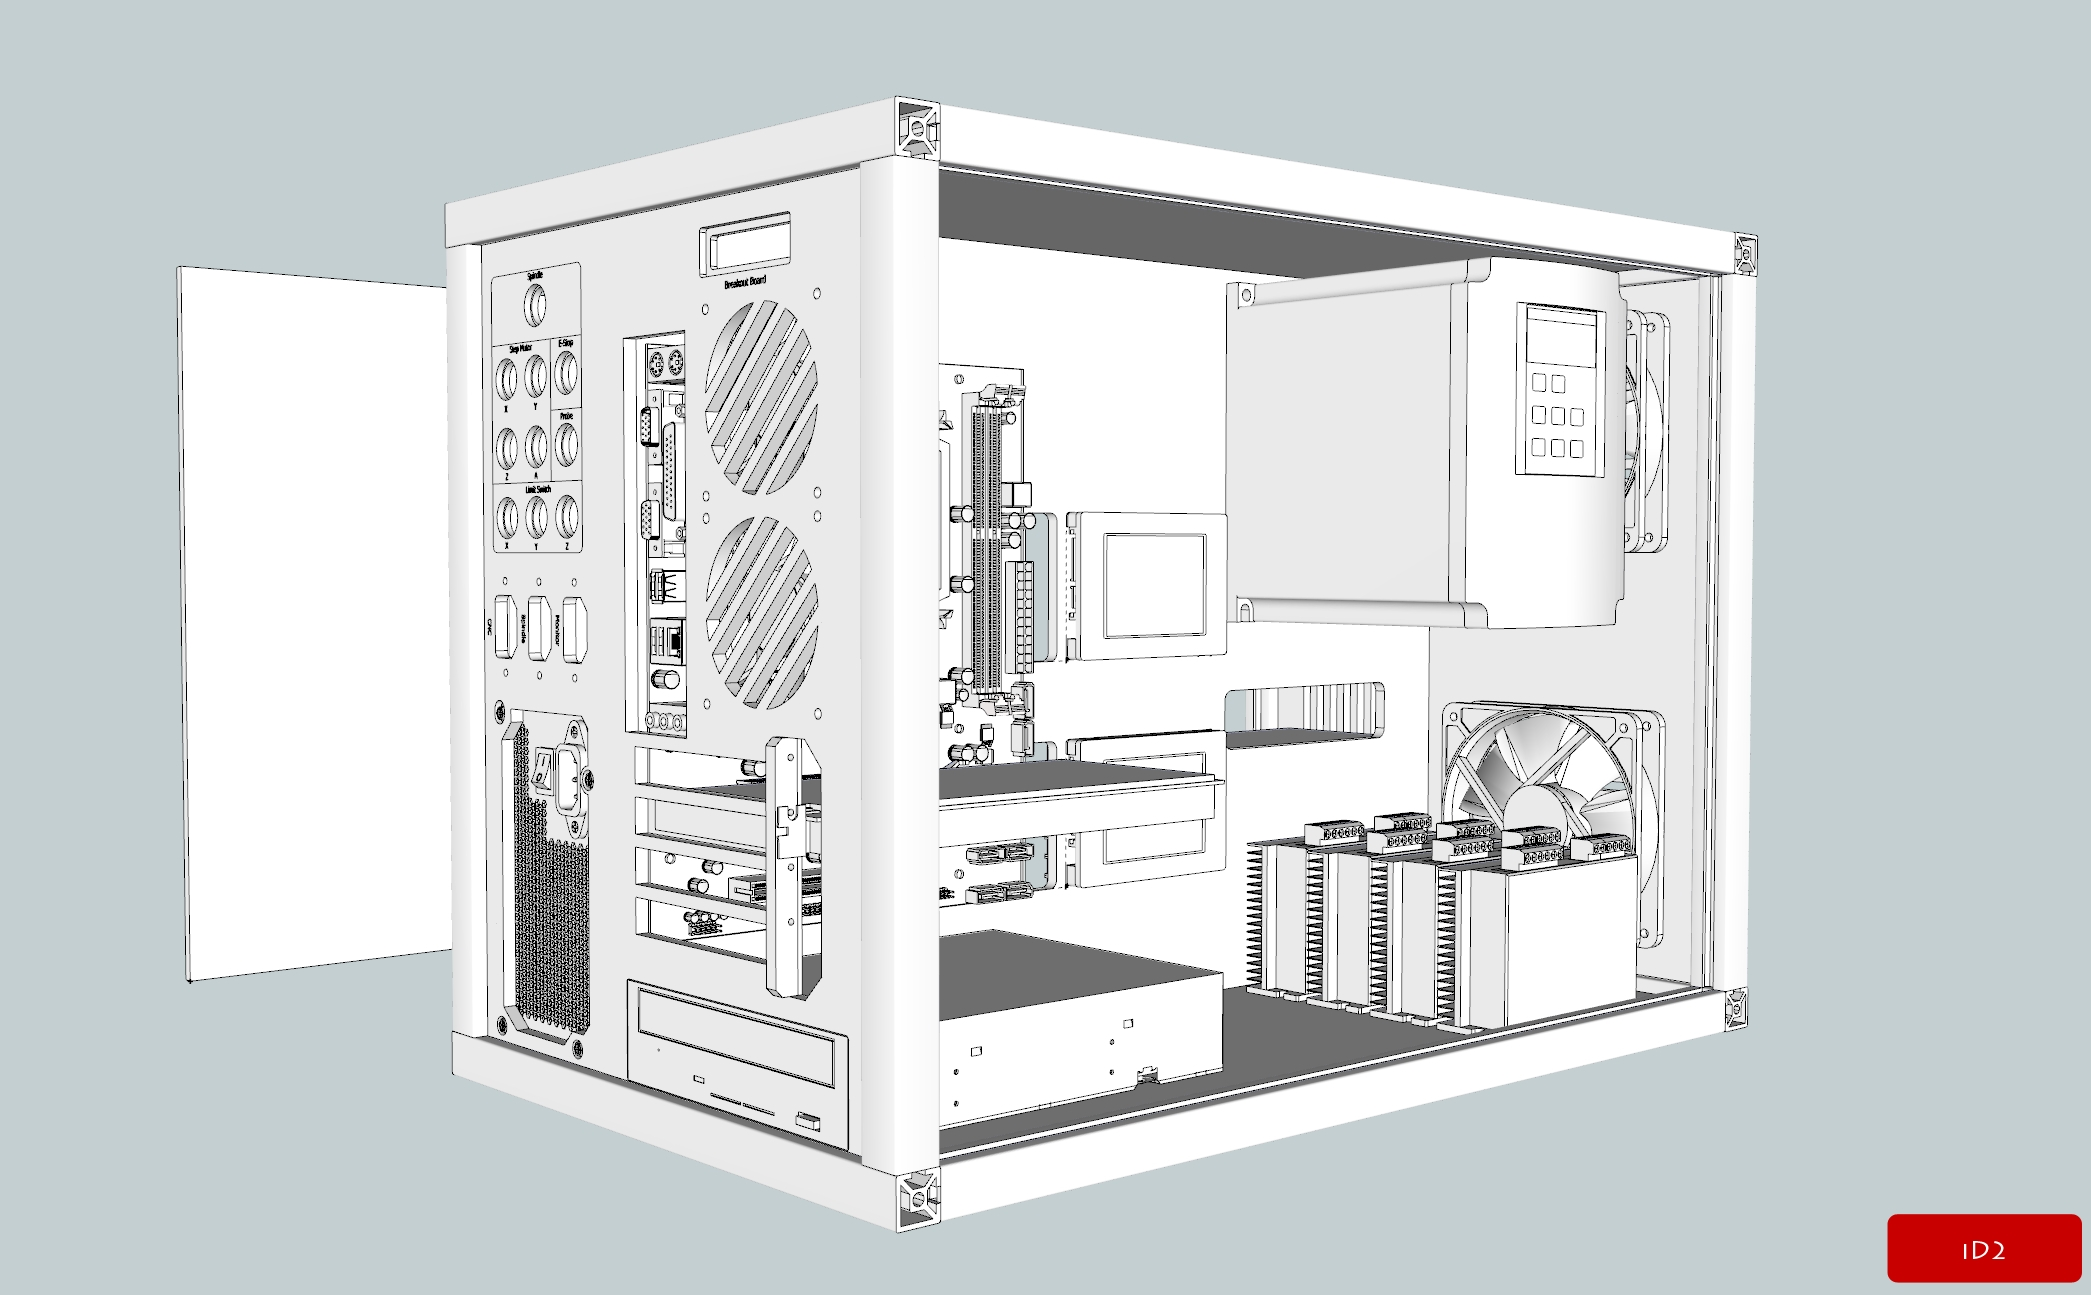 cnc controller box  draft design   u2013 id2cnc